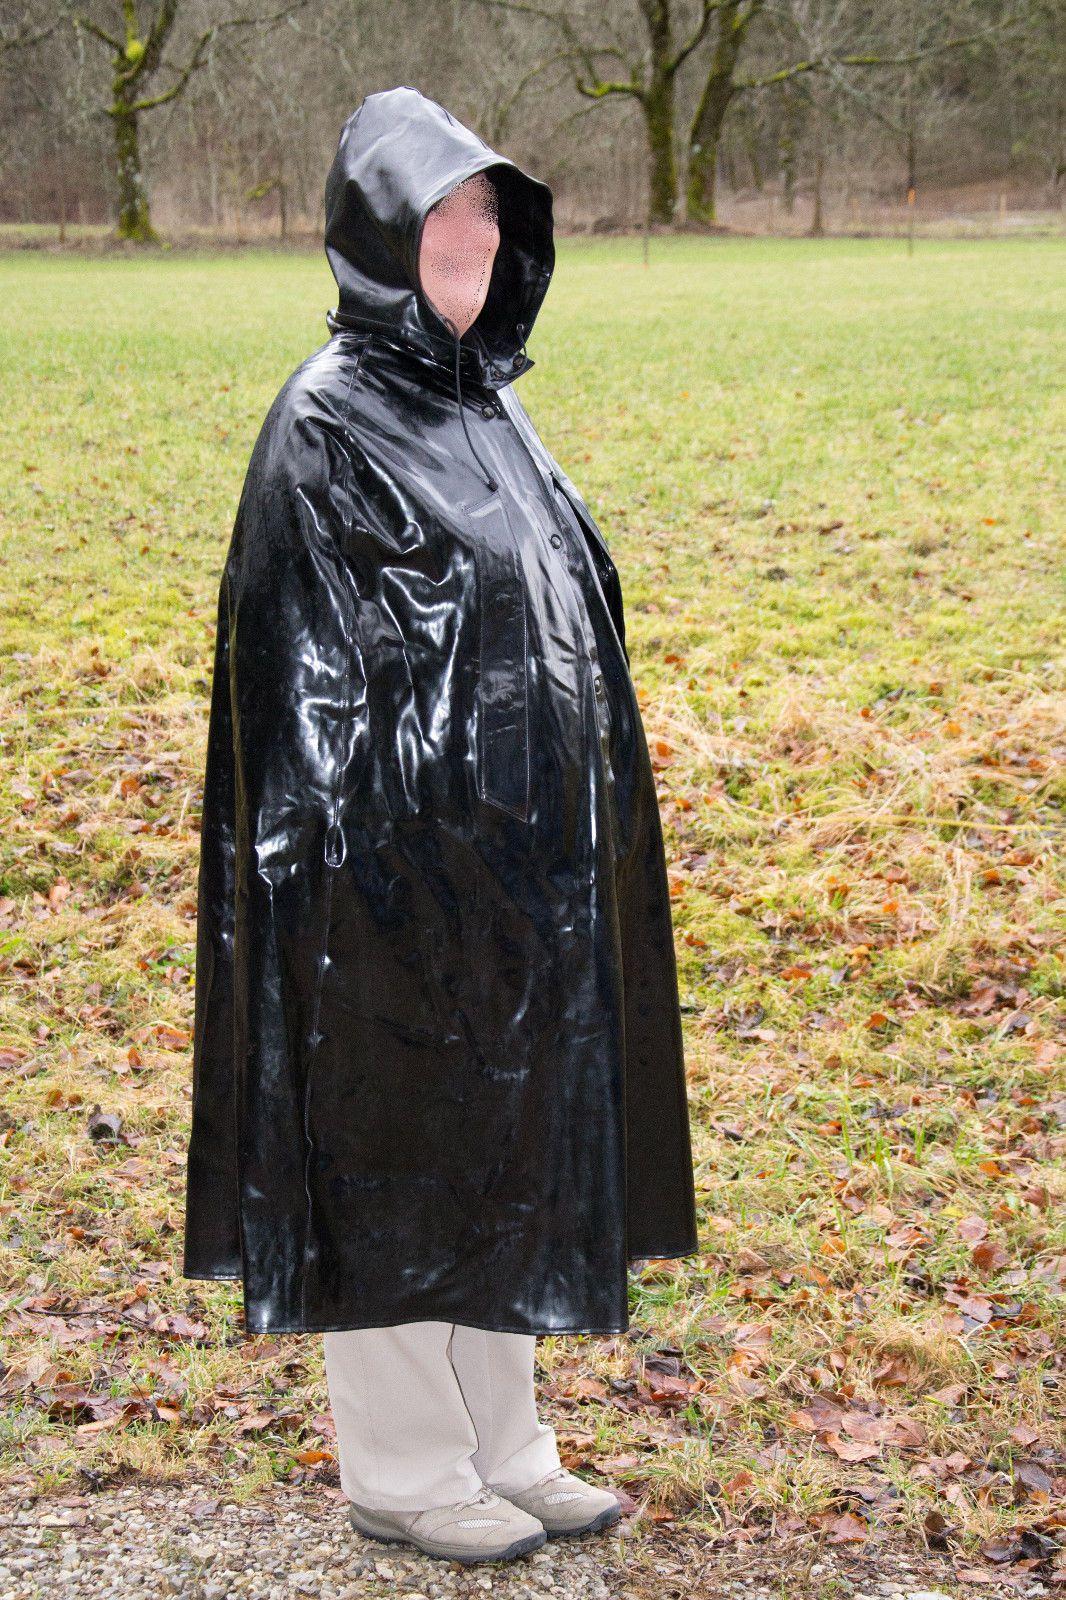 XXL Regencape Cape mit Kapuze 1,27 lang Gummi Regenmantel